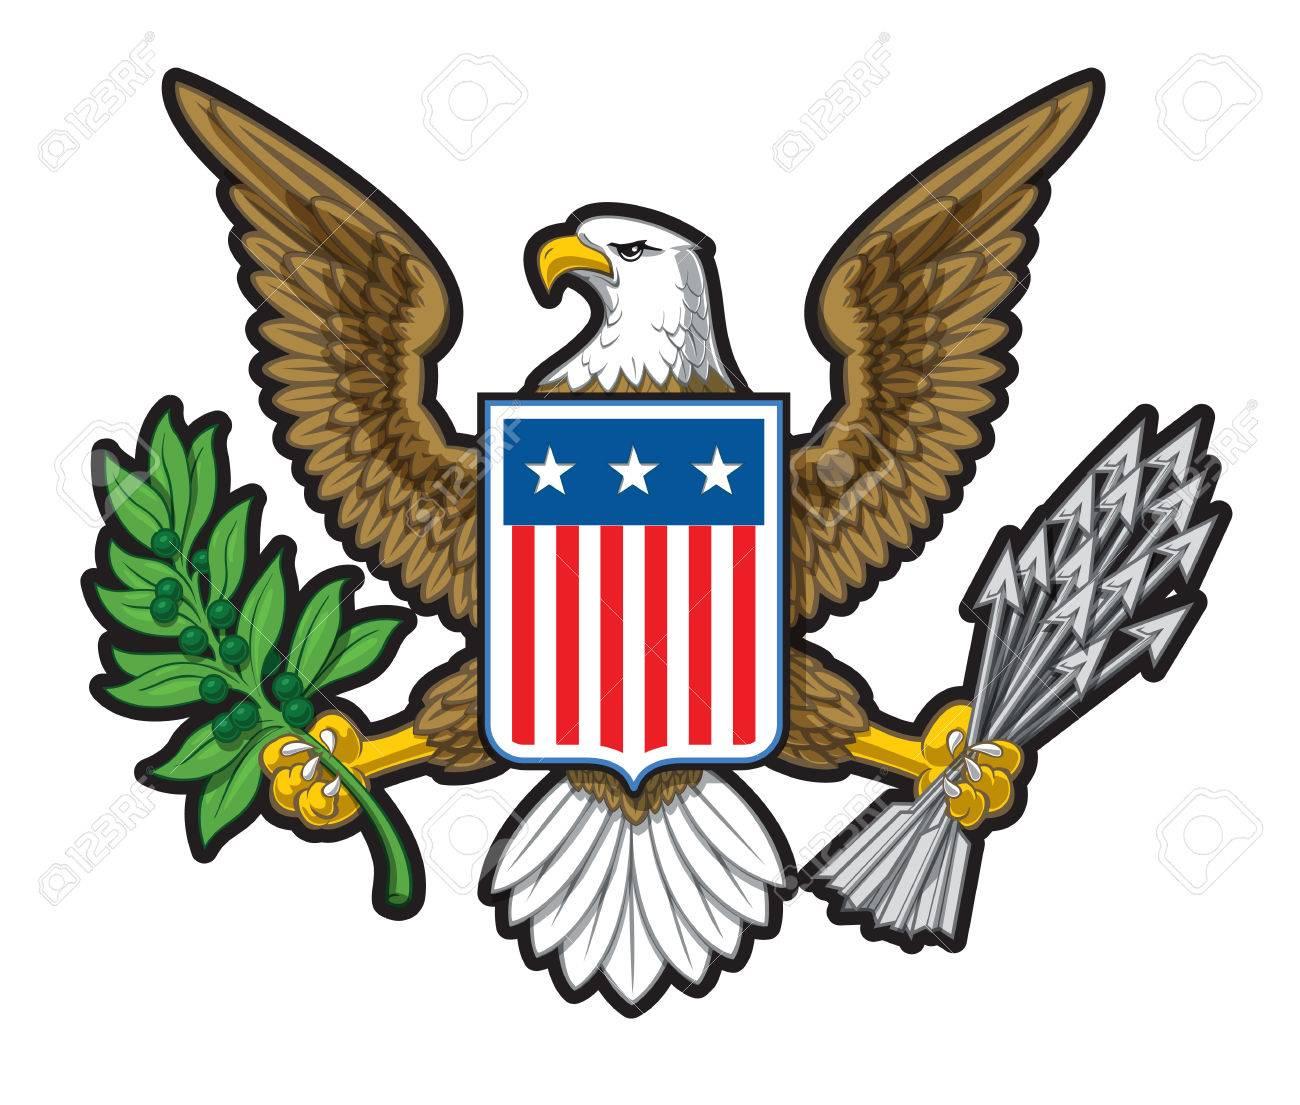 U s symbol clipart image Bald Eagle Clipart us symbol - Free Clipart on Gotravelaz.com image